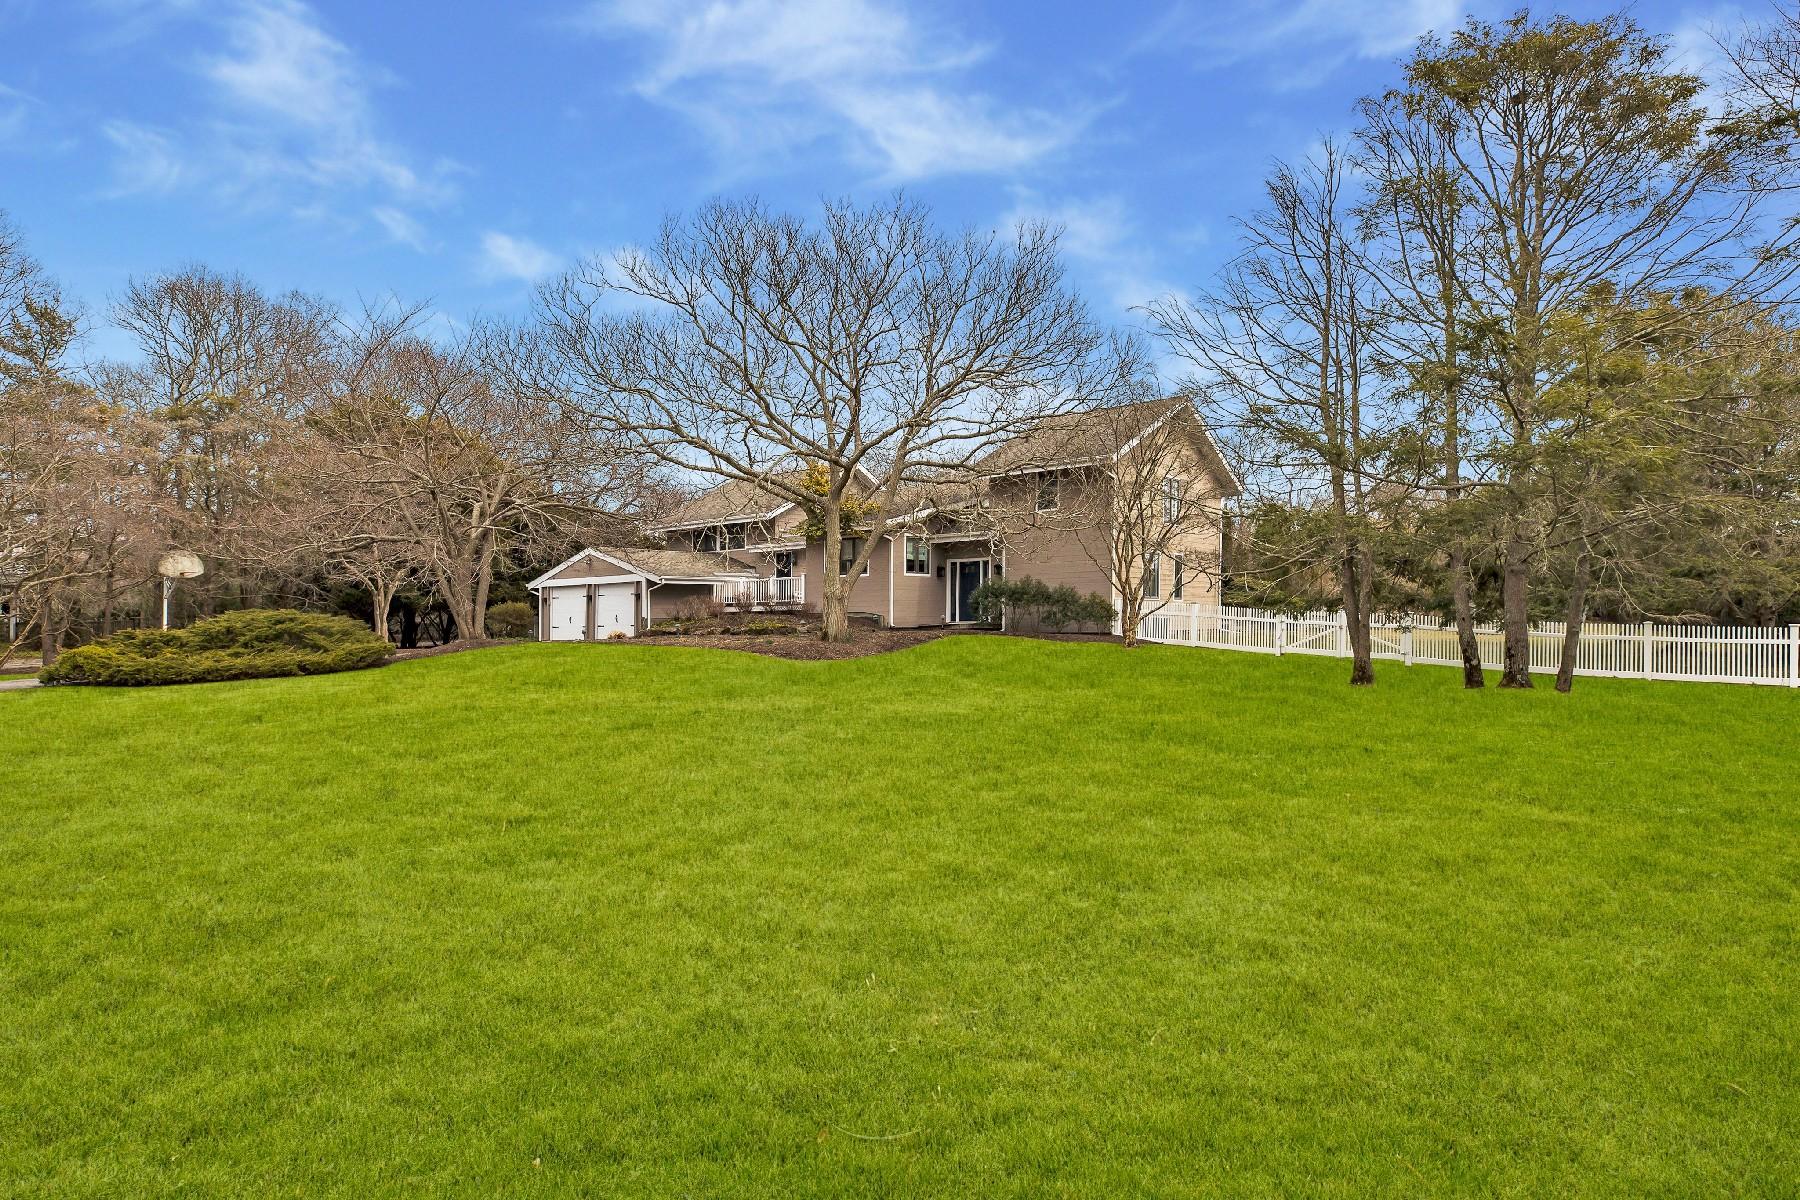 Single Family Homes for Sale at Remsenburg 16 Bridle Path Remsenburg, New York 11960 United States